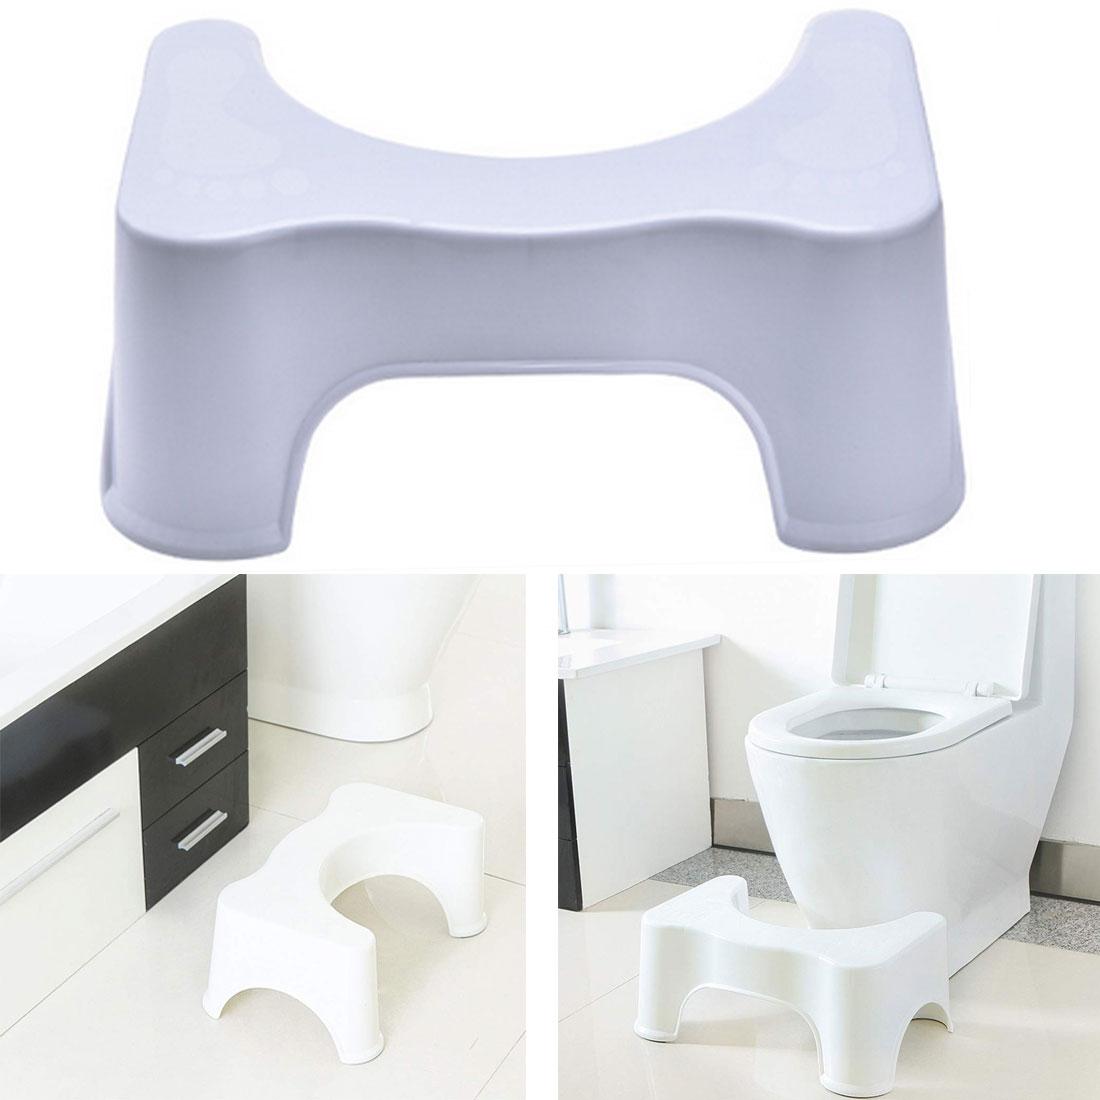 Thickened Non-Slip Bathroom Toilet Step Stool Elderly  Woman Child Stool Heightened Stool Baby Anti-Fall Toilet Stool 2